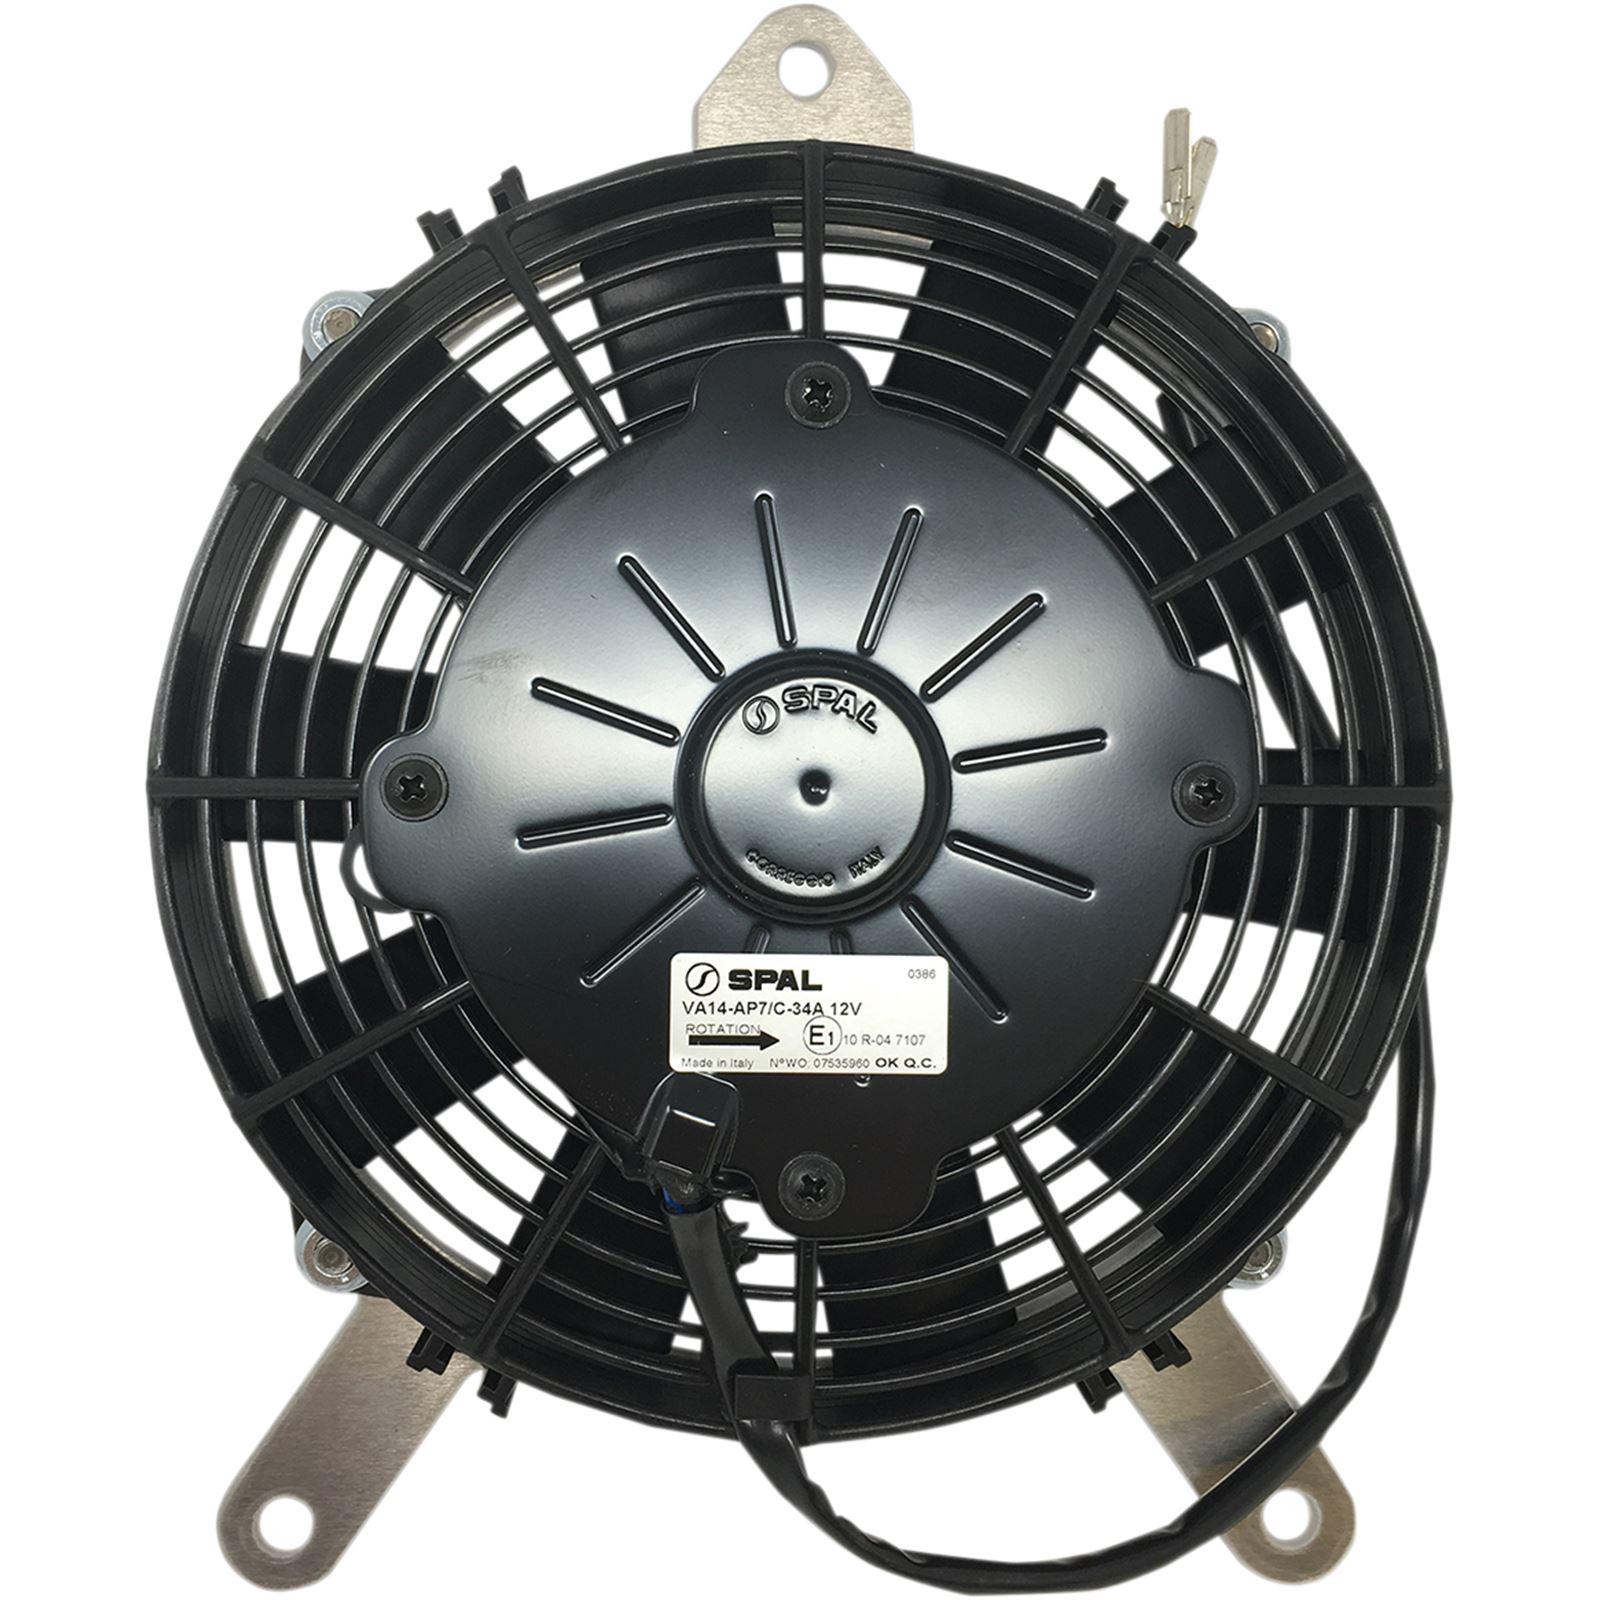 Moose Hi-Performance Cooling Fan - 440 CFM